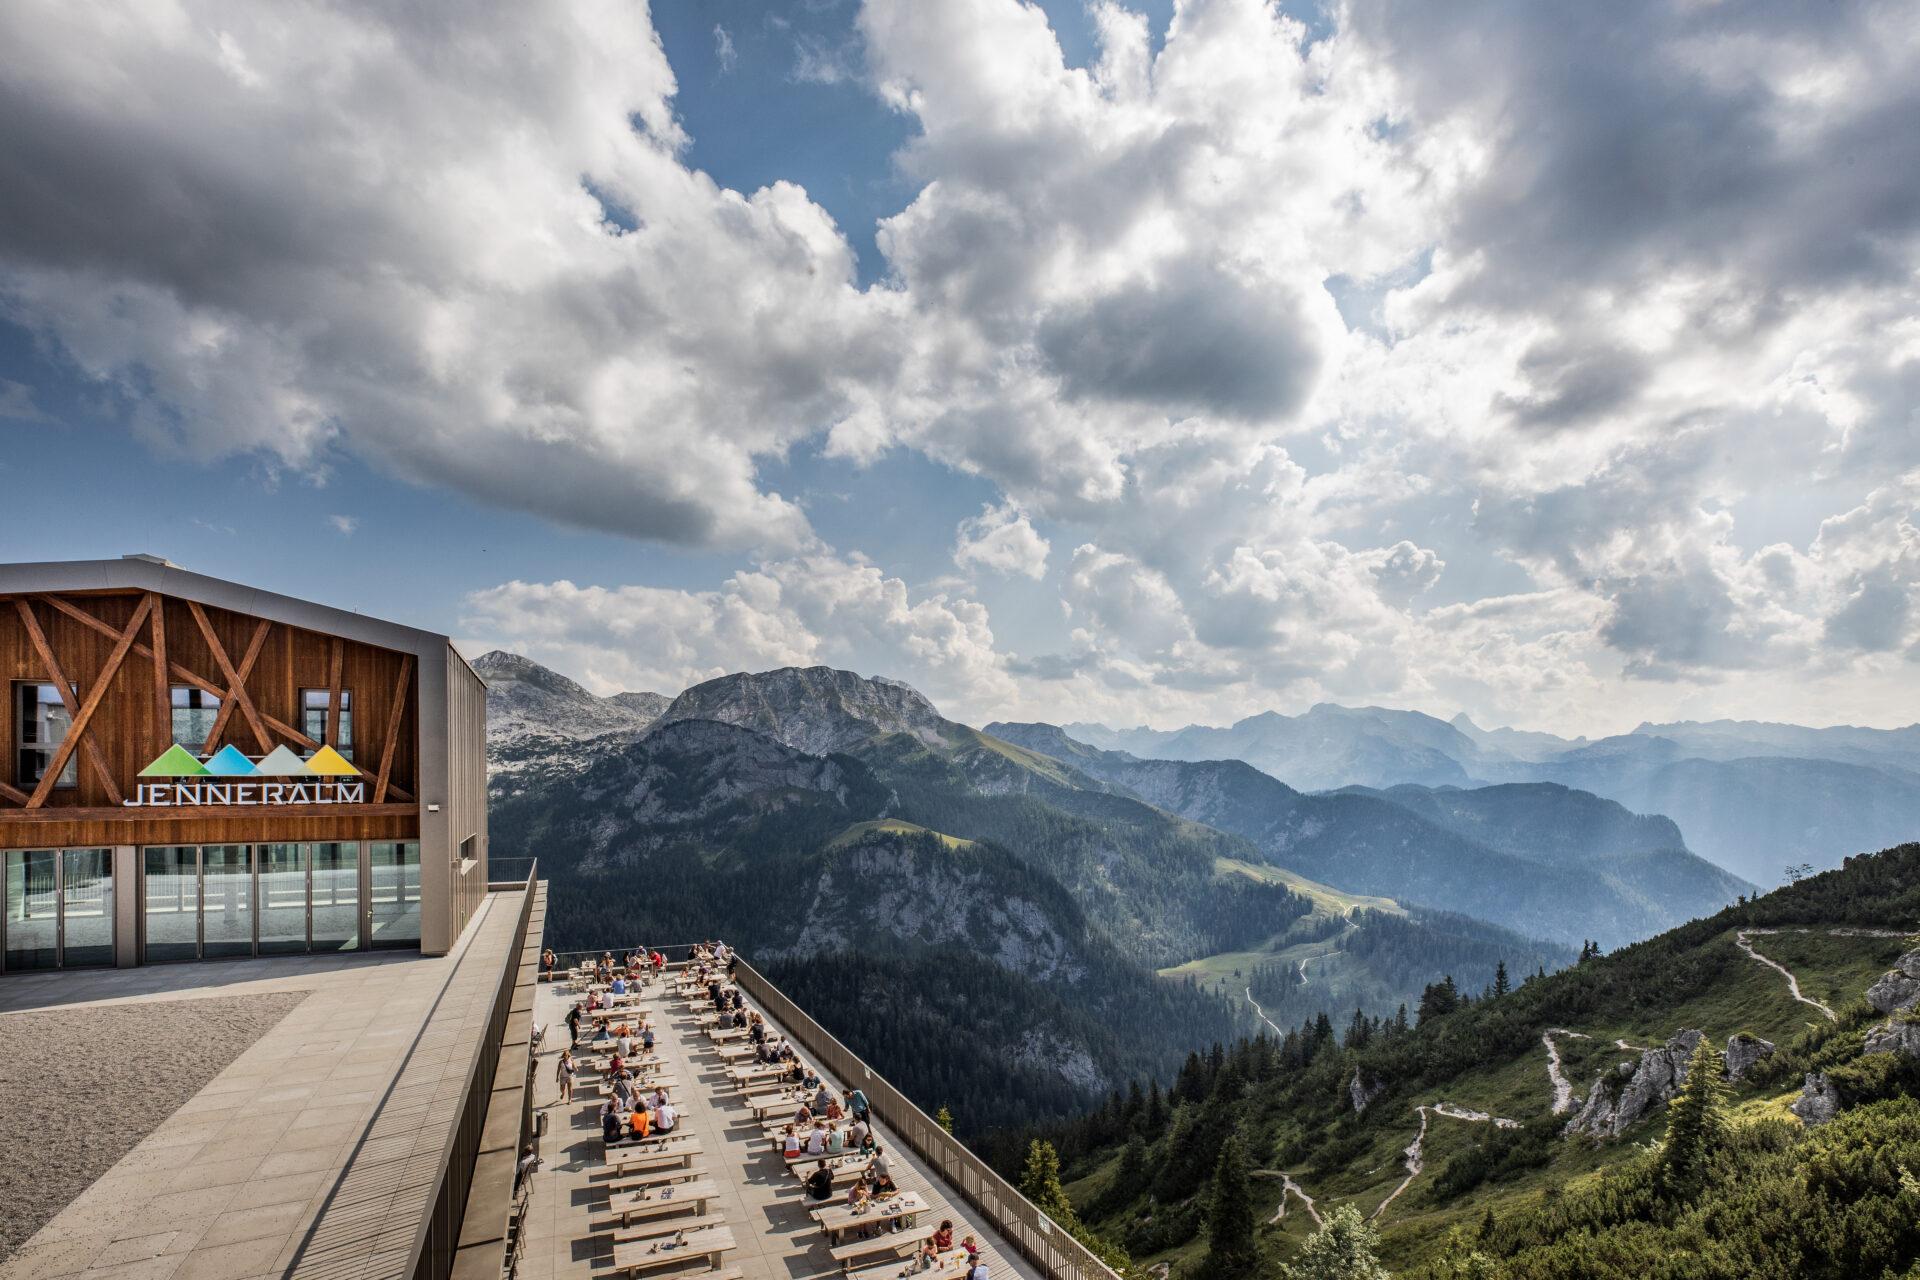 Jennerbahn Panorama mit Bergstation und Terrasse